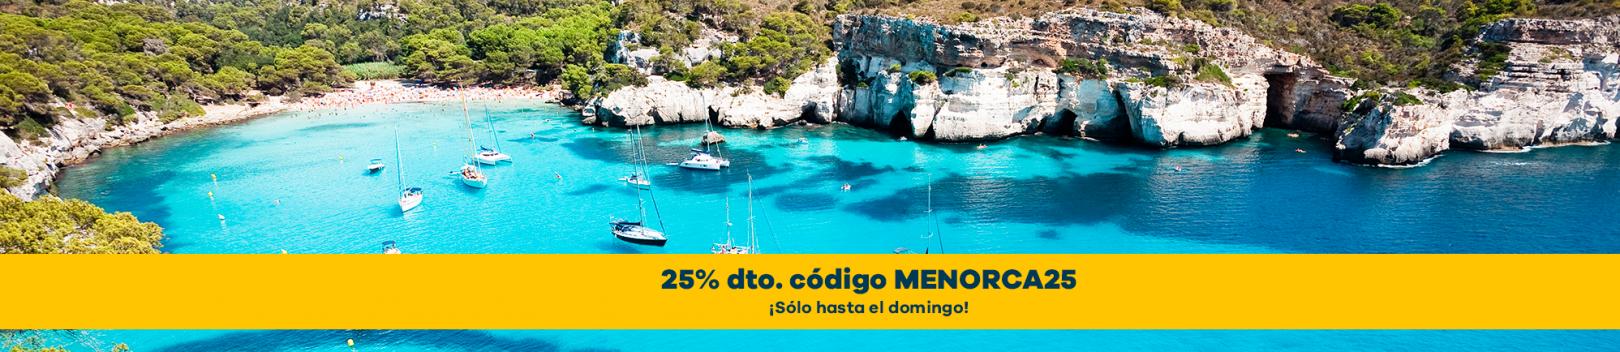 Alquiler de motos en Menorca